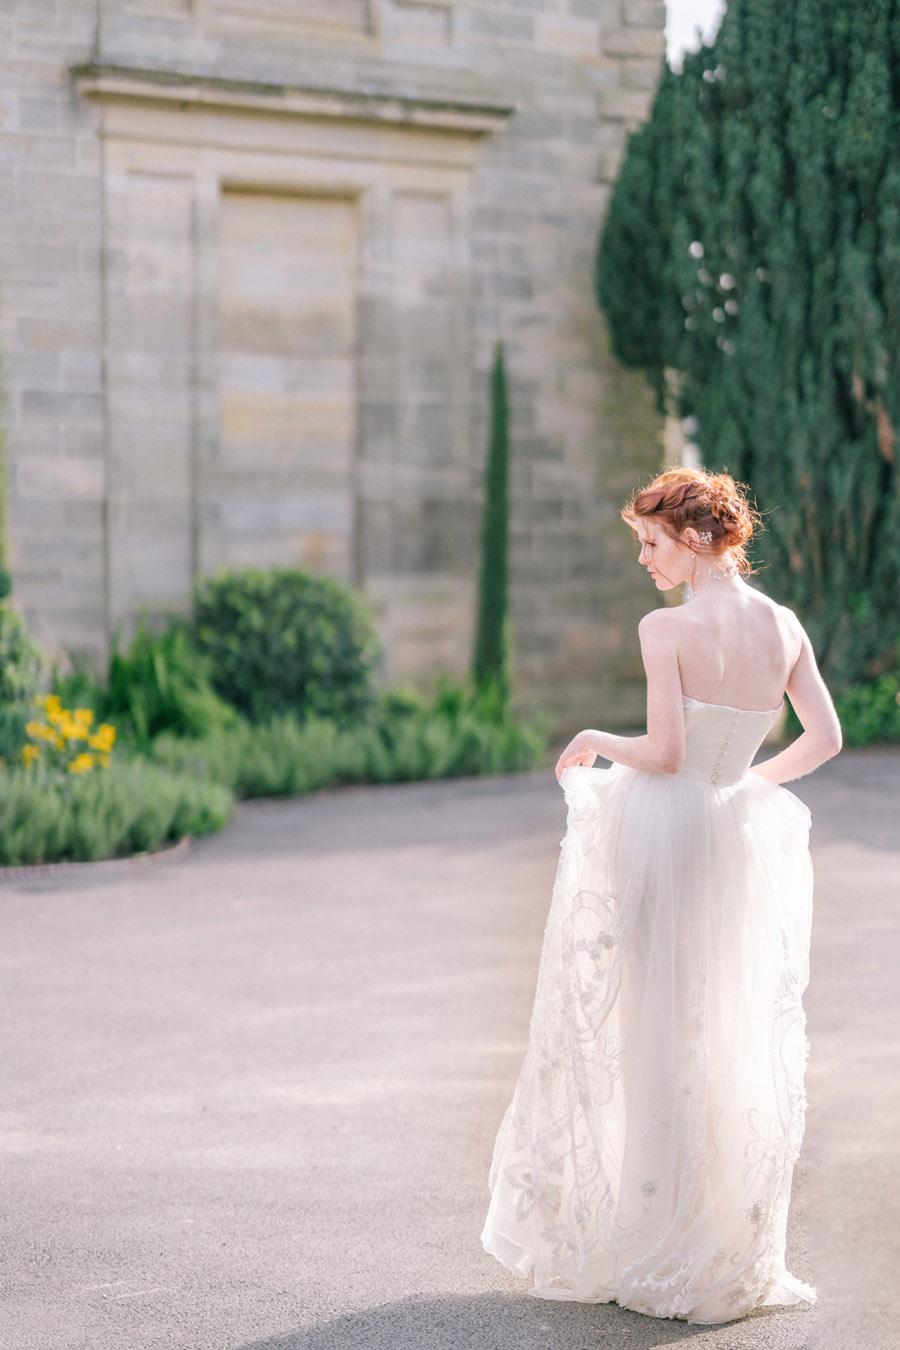 Beautiful emerald green and mustard wedding style ideas, photography by Ioana Porav (4)